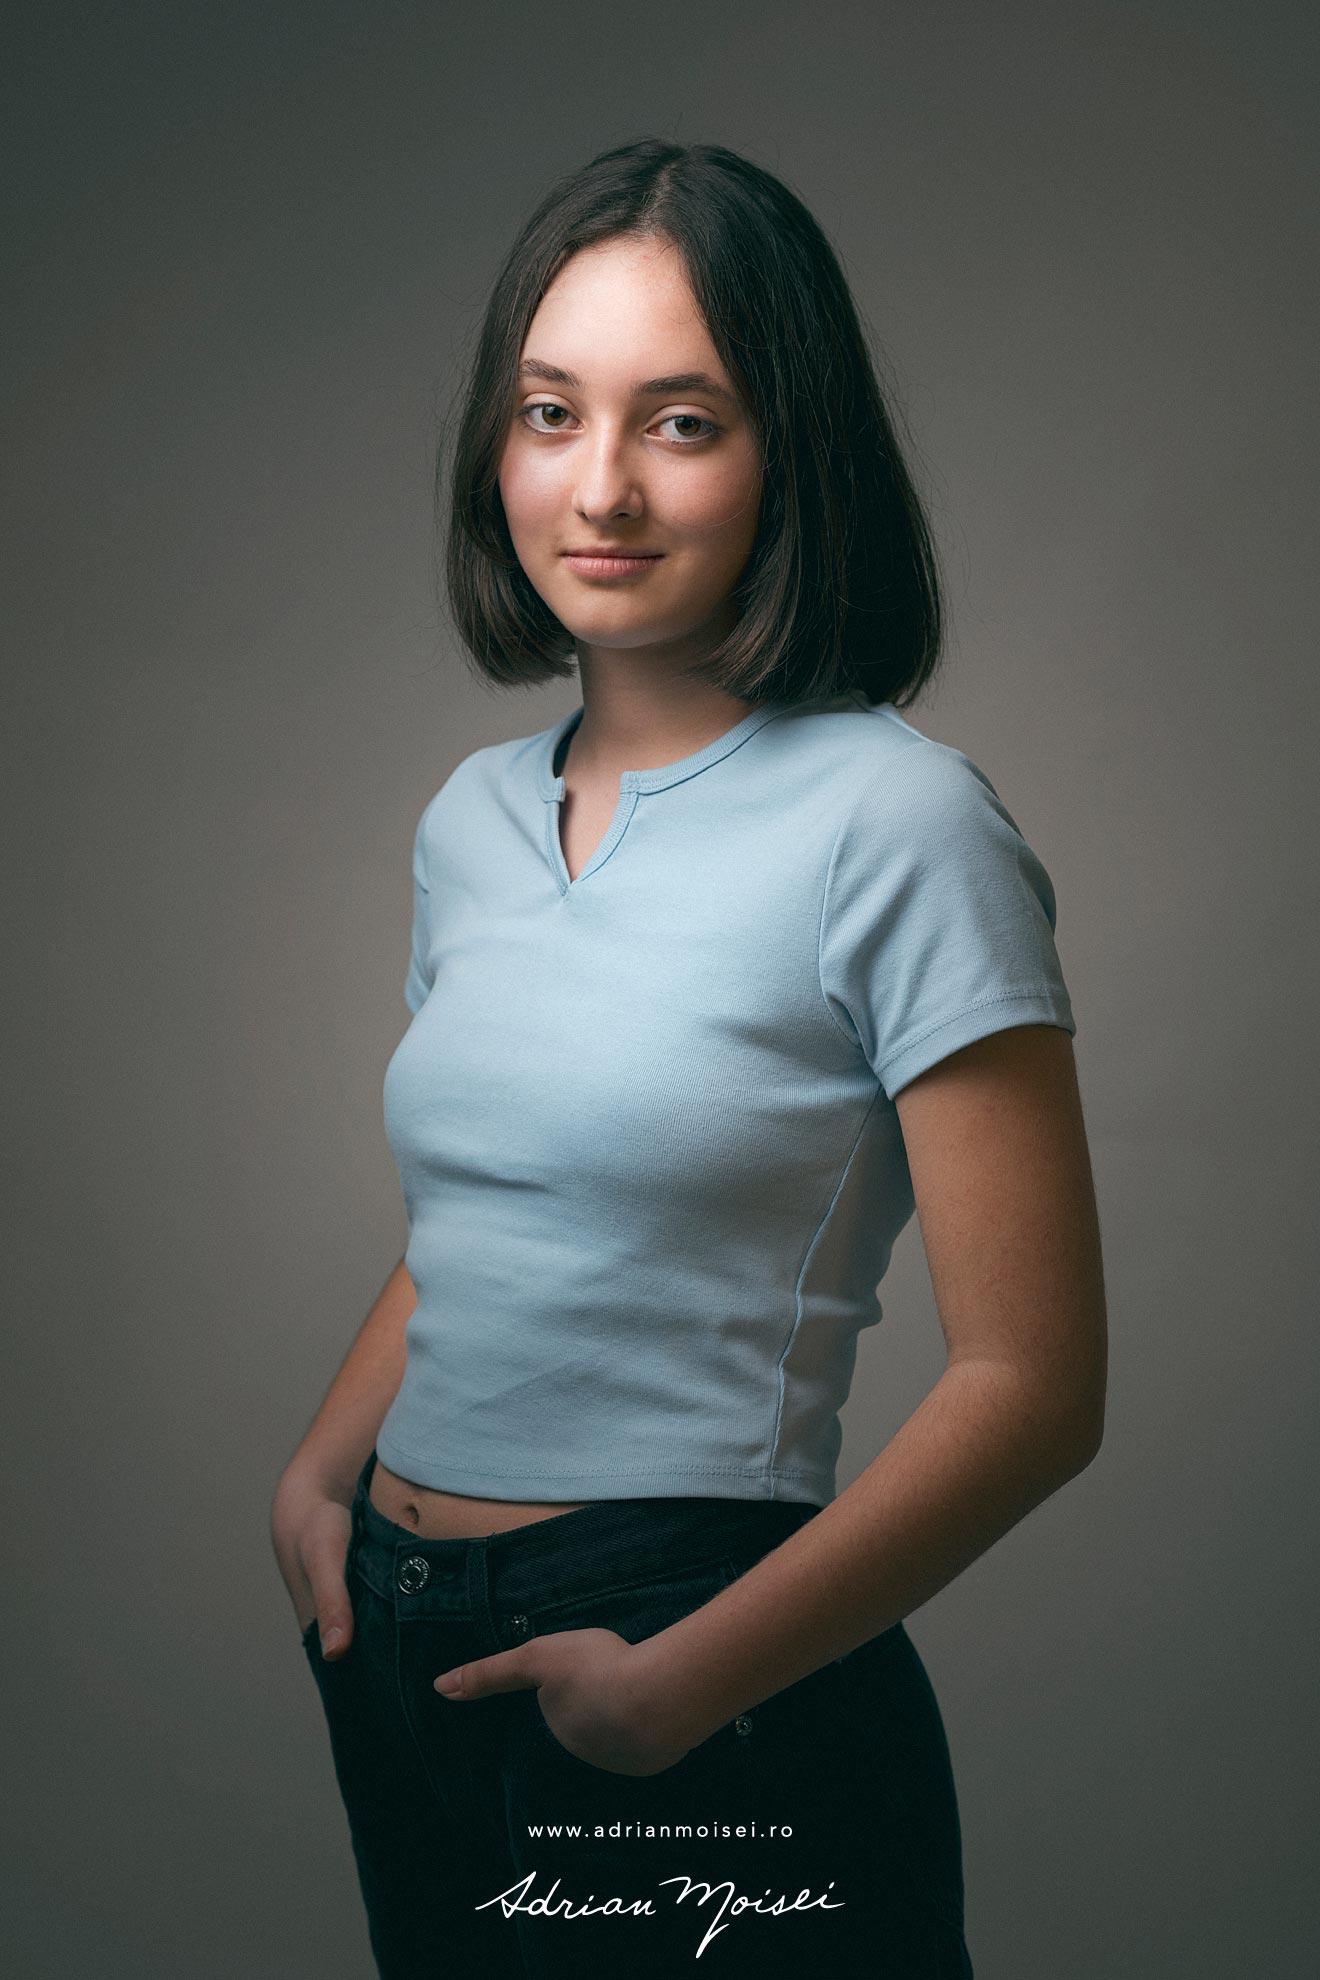 Vreau sa fiu actrita - fotografii cu Bodgana - o adolescenta ce isi doreste sa devina actrita - la studio foto-video Adrian Moisei